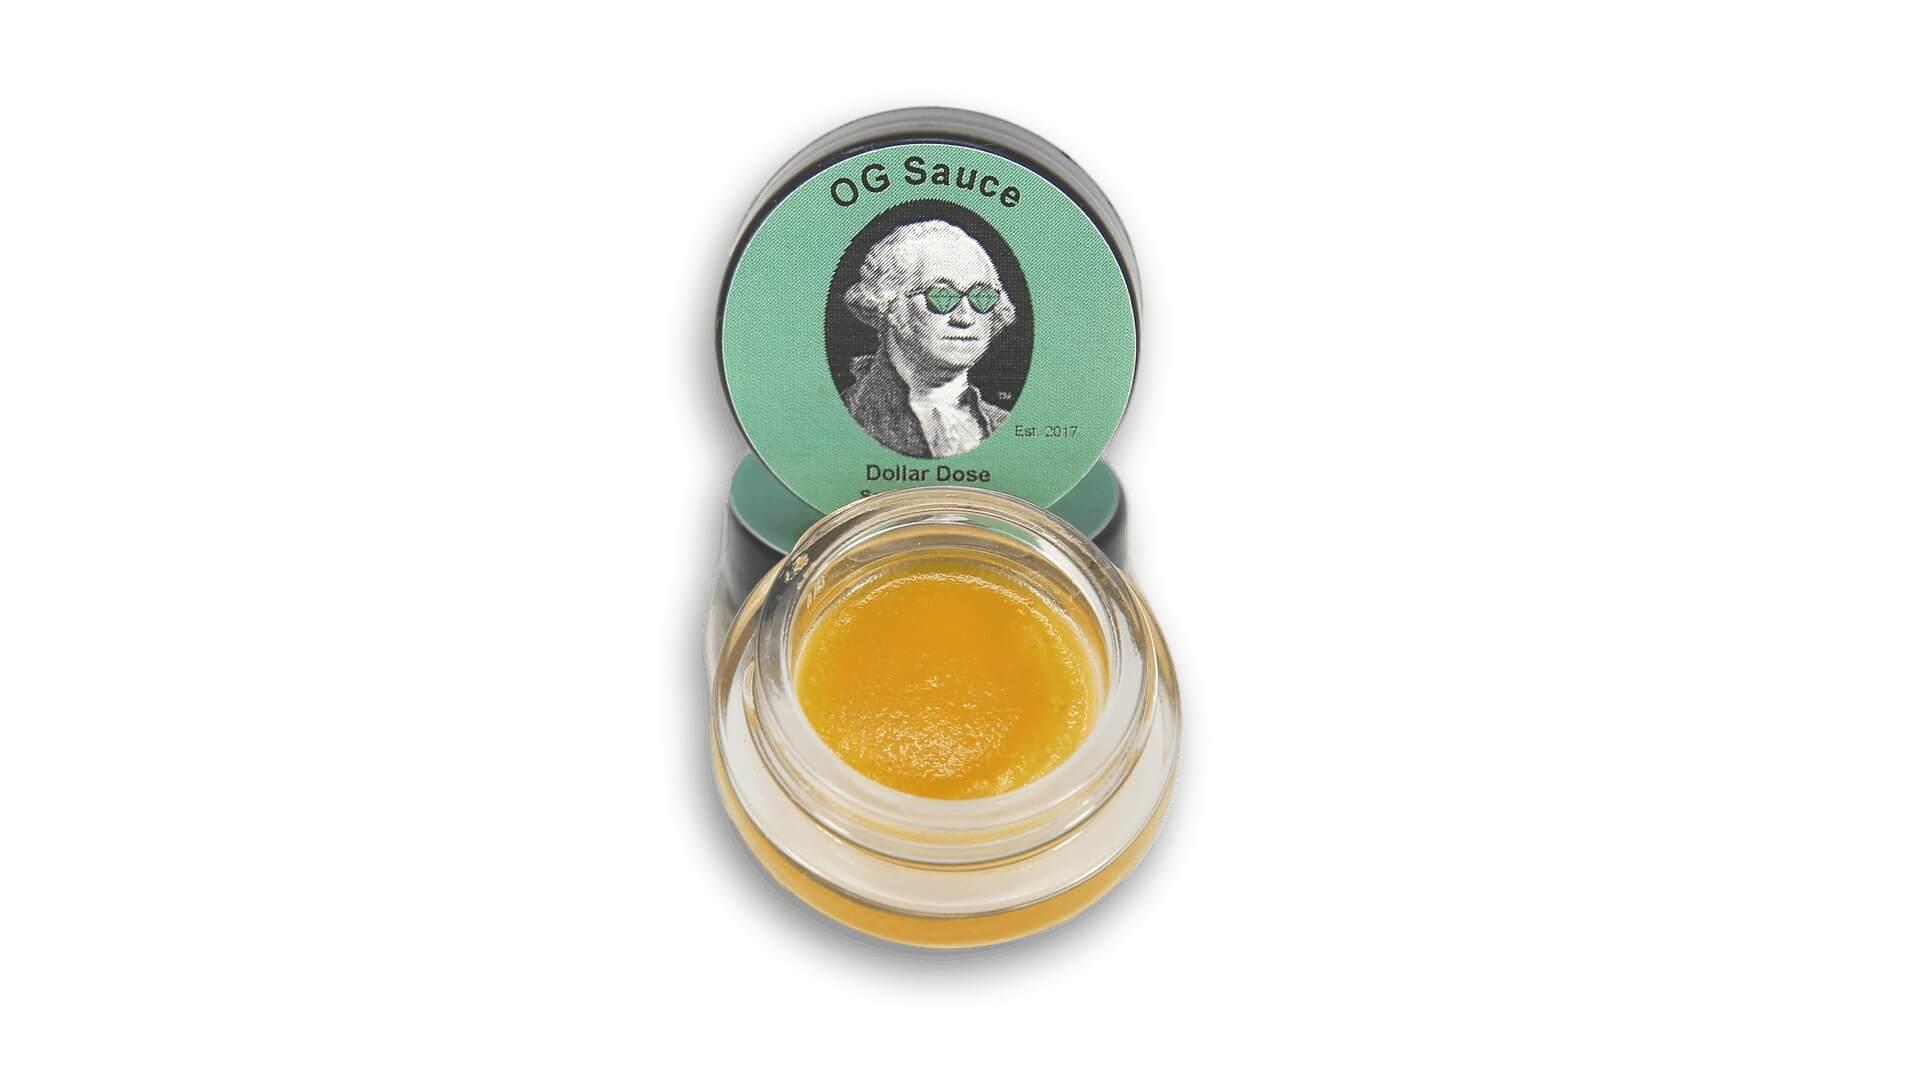 Dollar Dose sauce